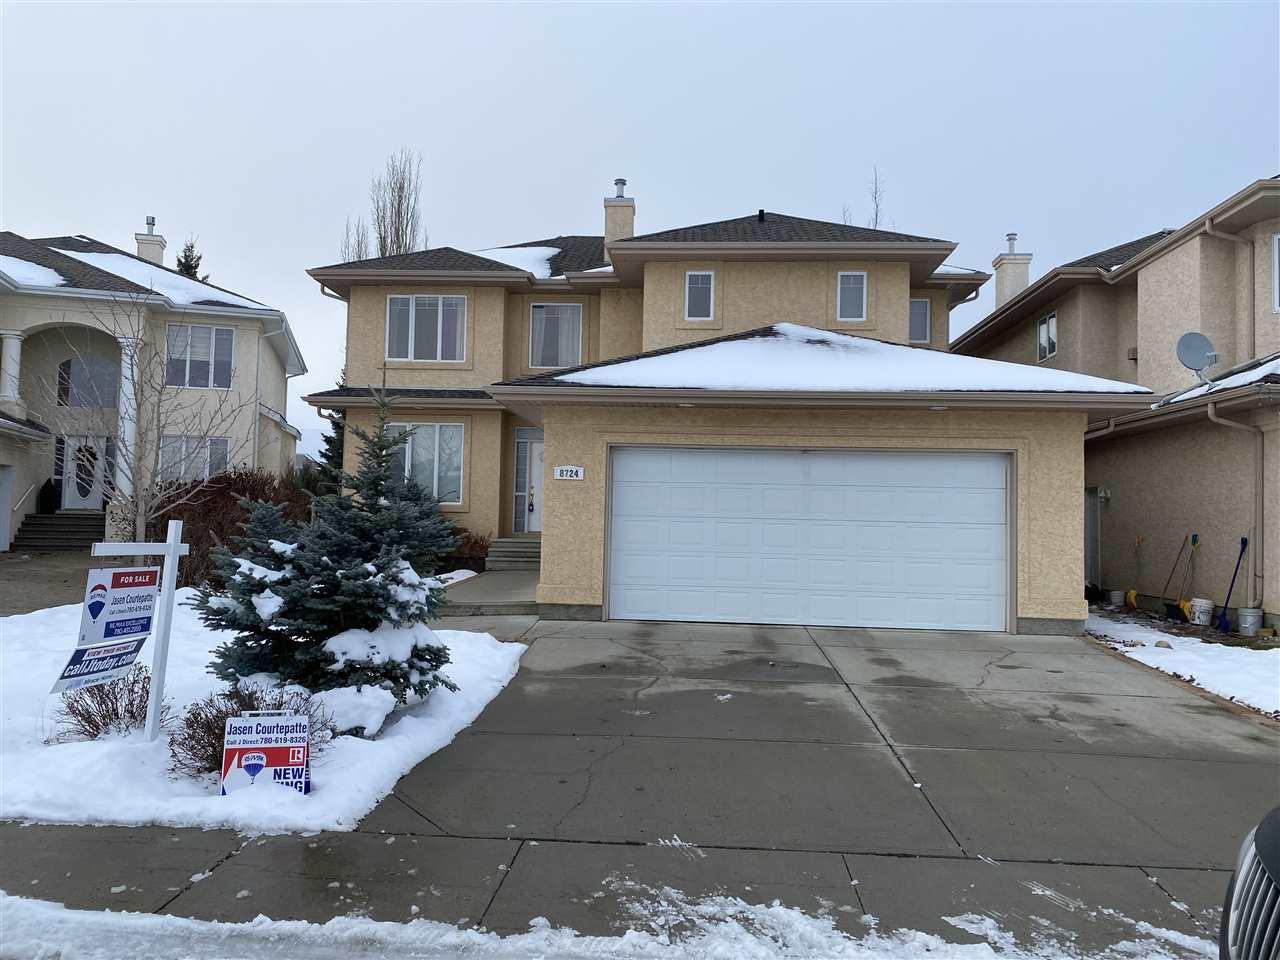 Main Photo: 8724 208 Street in Edmonton: Zone 58 House for sale : MLS®# E4176971